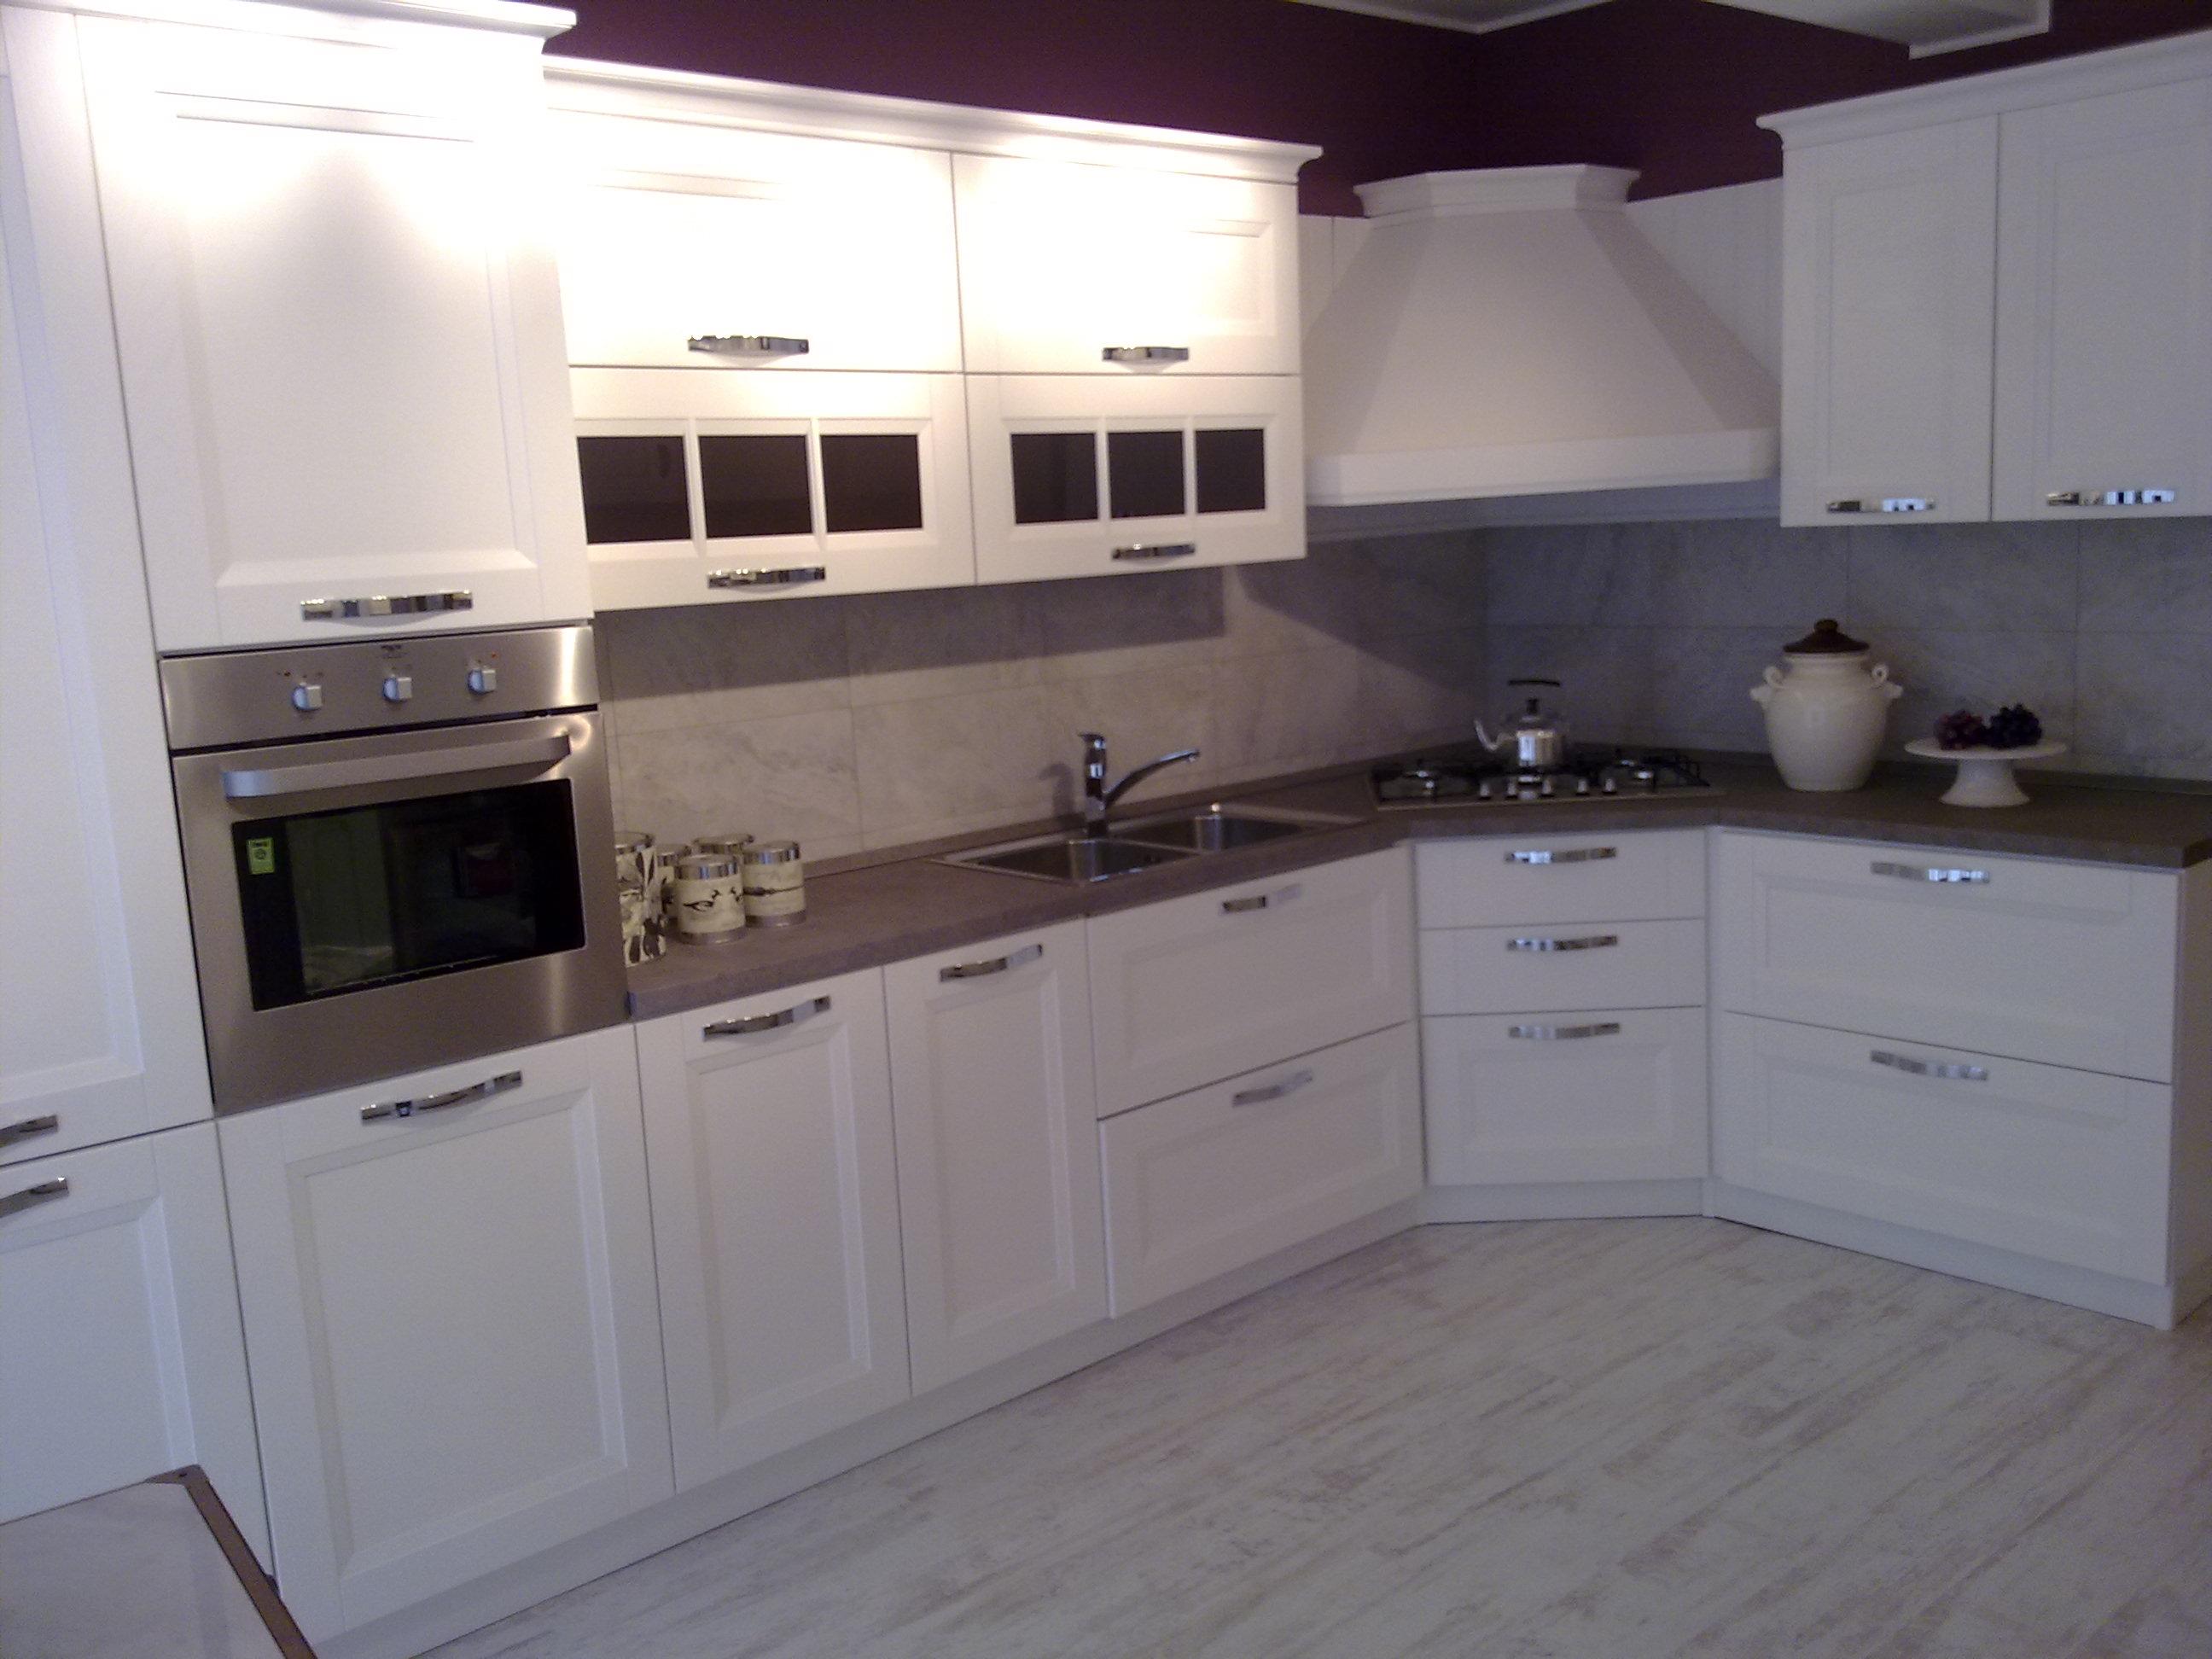 Stunning cucina beverly stosa prezzi pictures home ideas - Listino prezzi cucine stosa ...